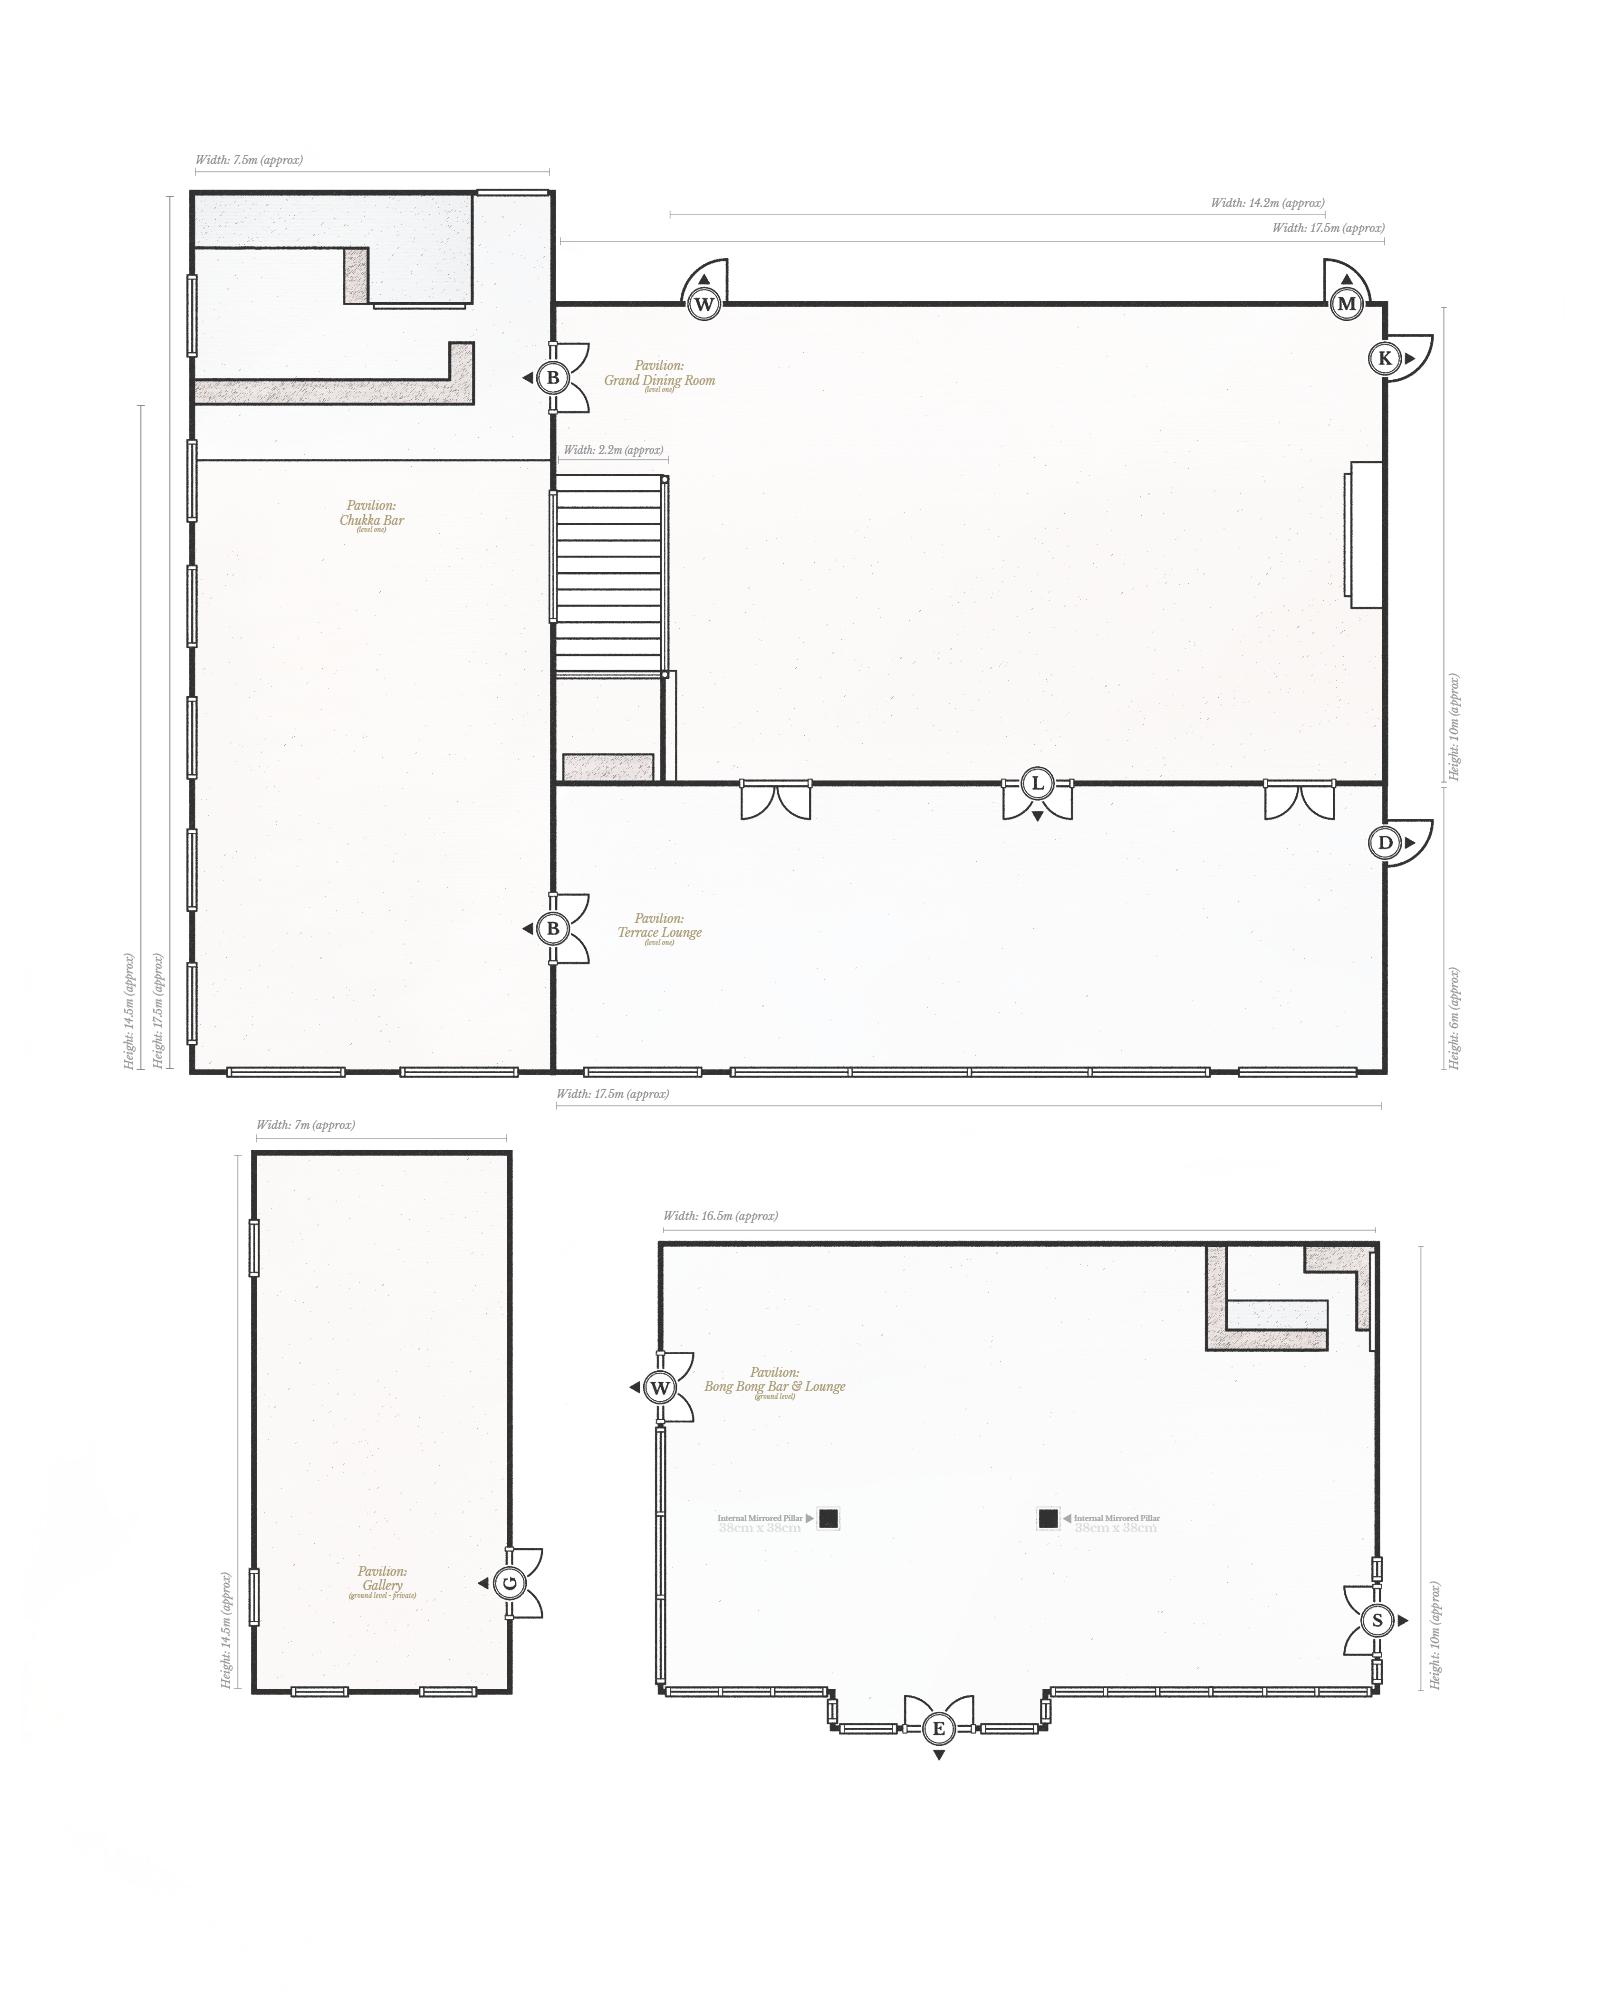 Hopewood House - Pavilion - Floor Plans (Ground Level + Level One) - Measurements